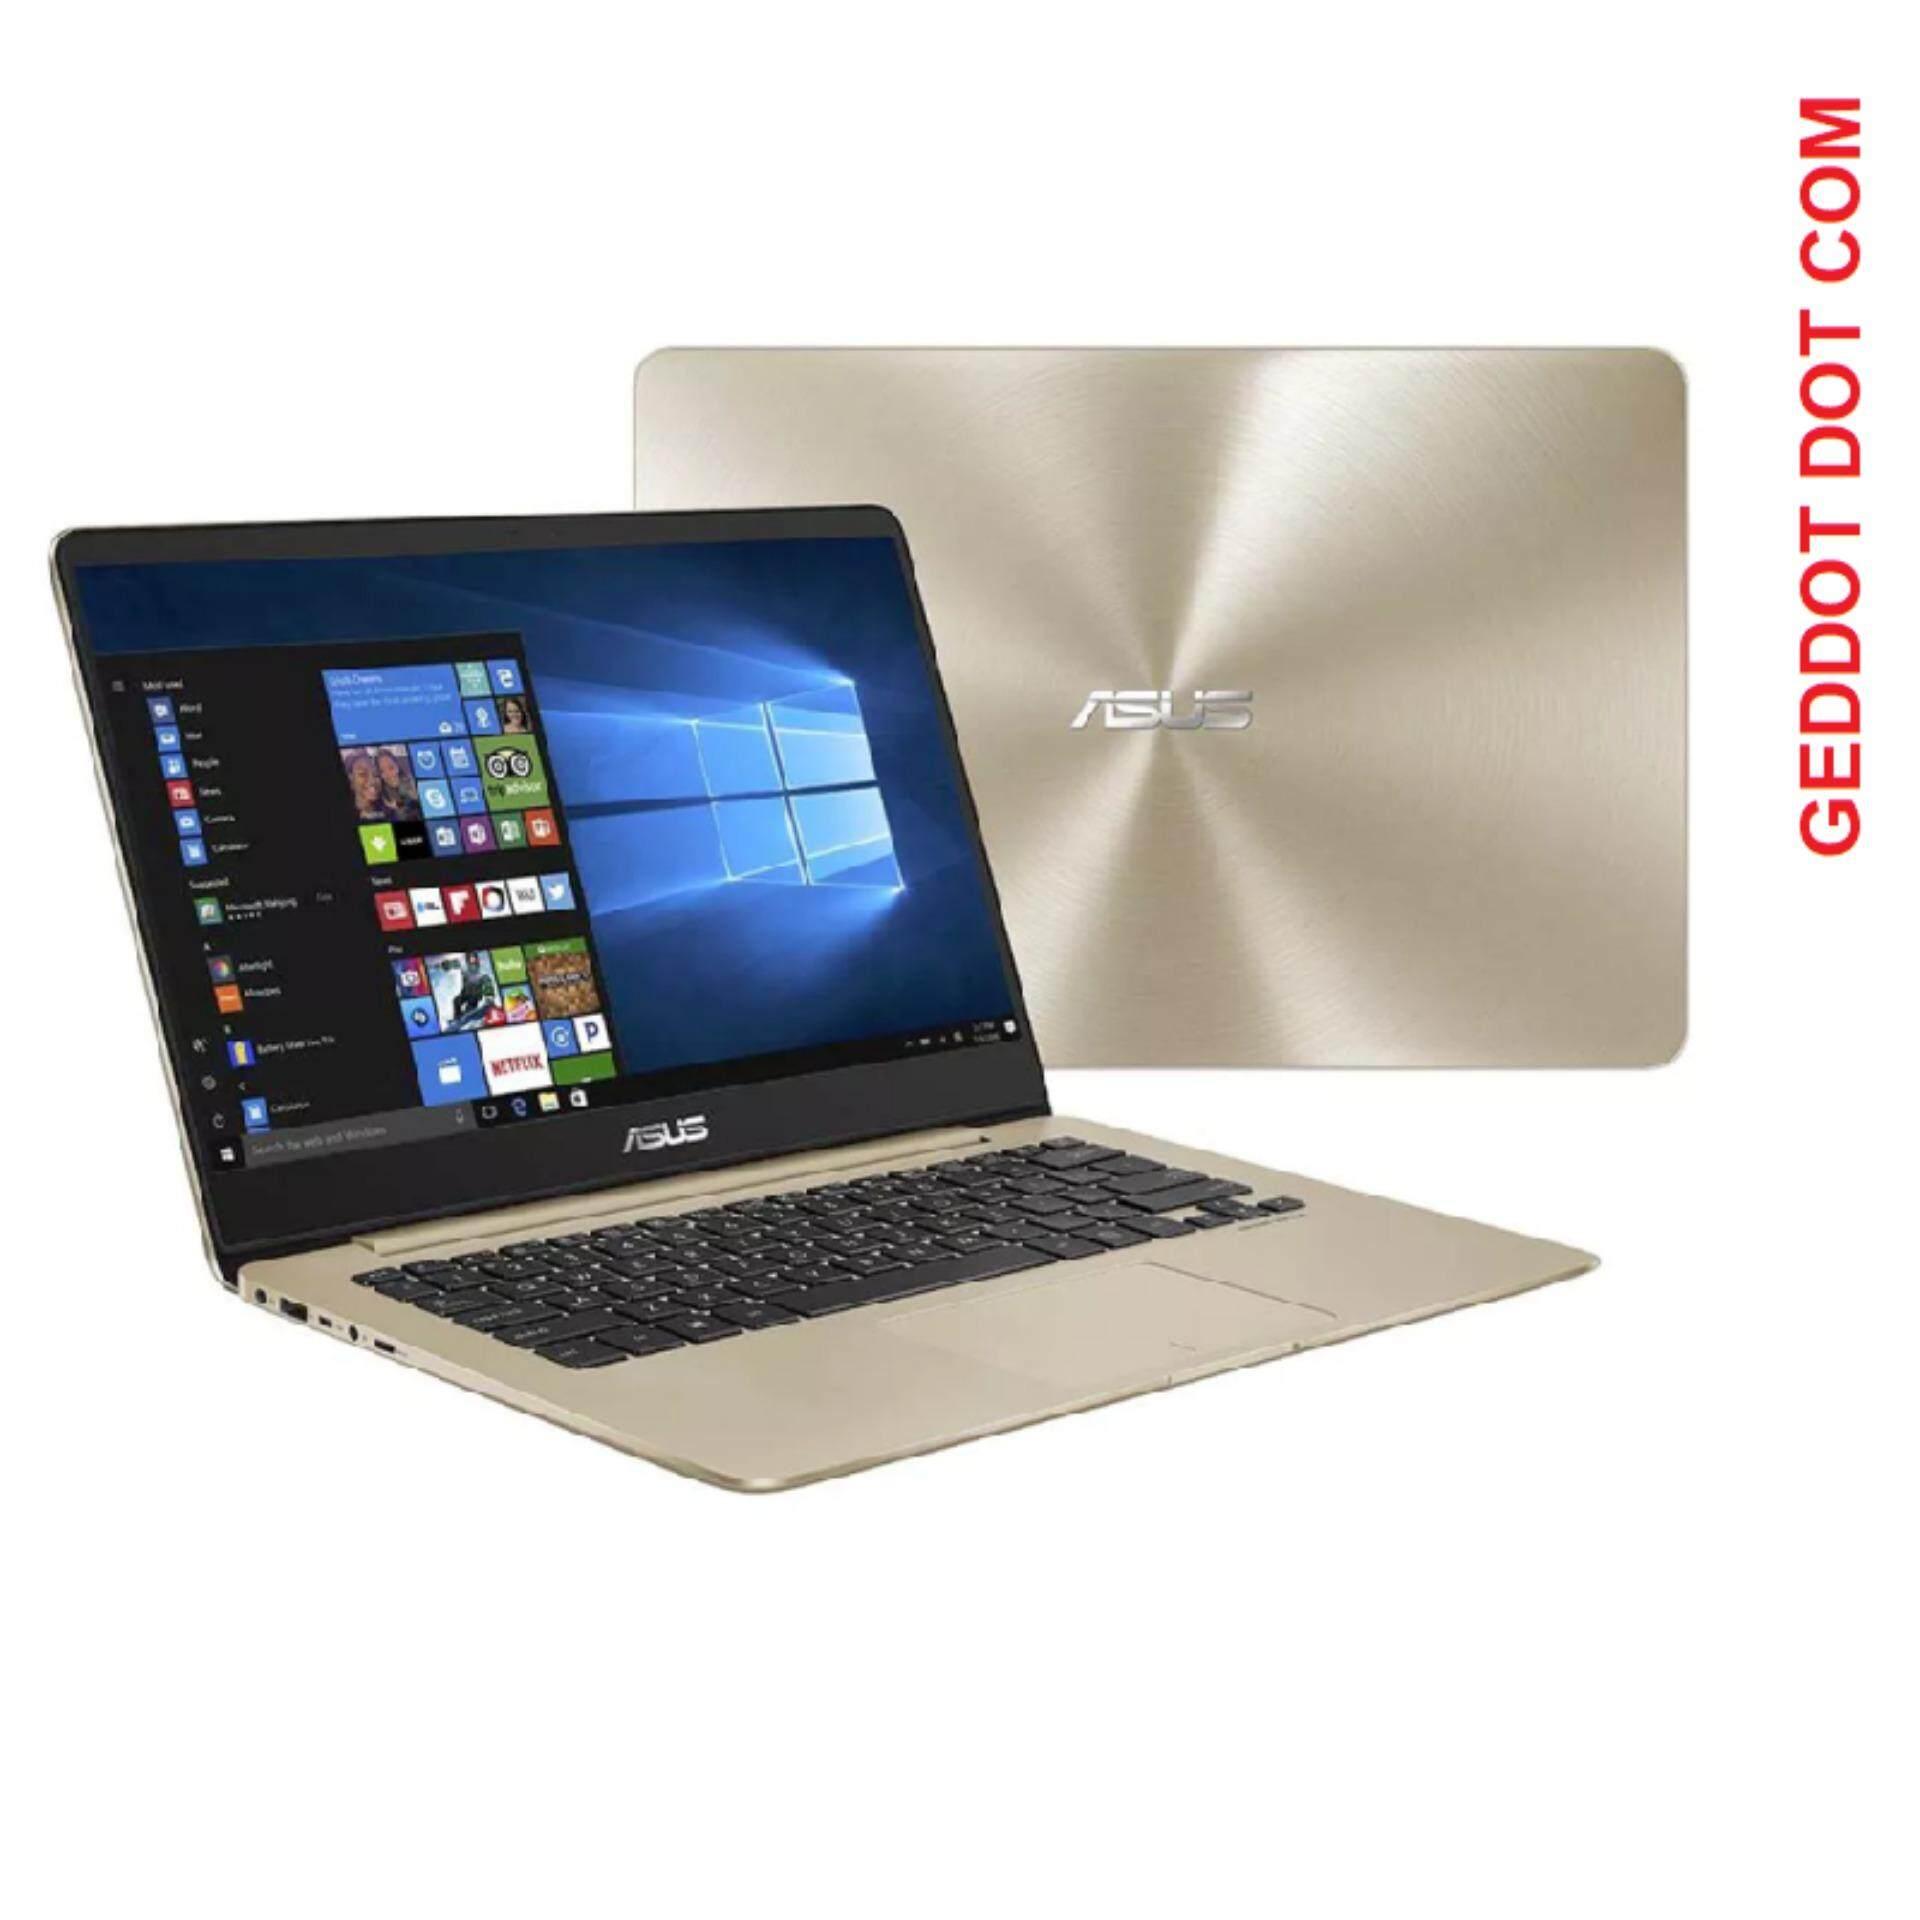 ASUS Zenbook UX430U-AGV215T NOTEBOOK (I5-7200,8GB,256GB SSD,W10,14,GOLD) Malaysia